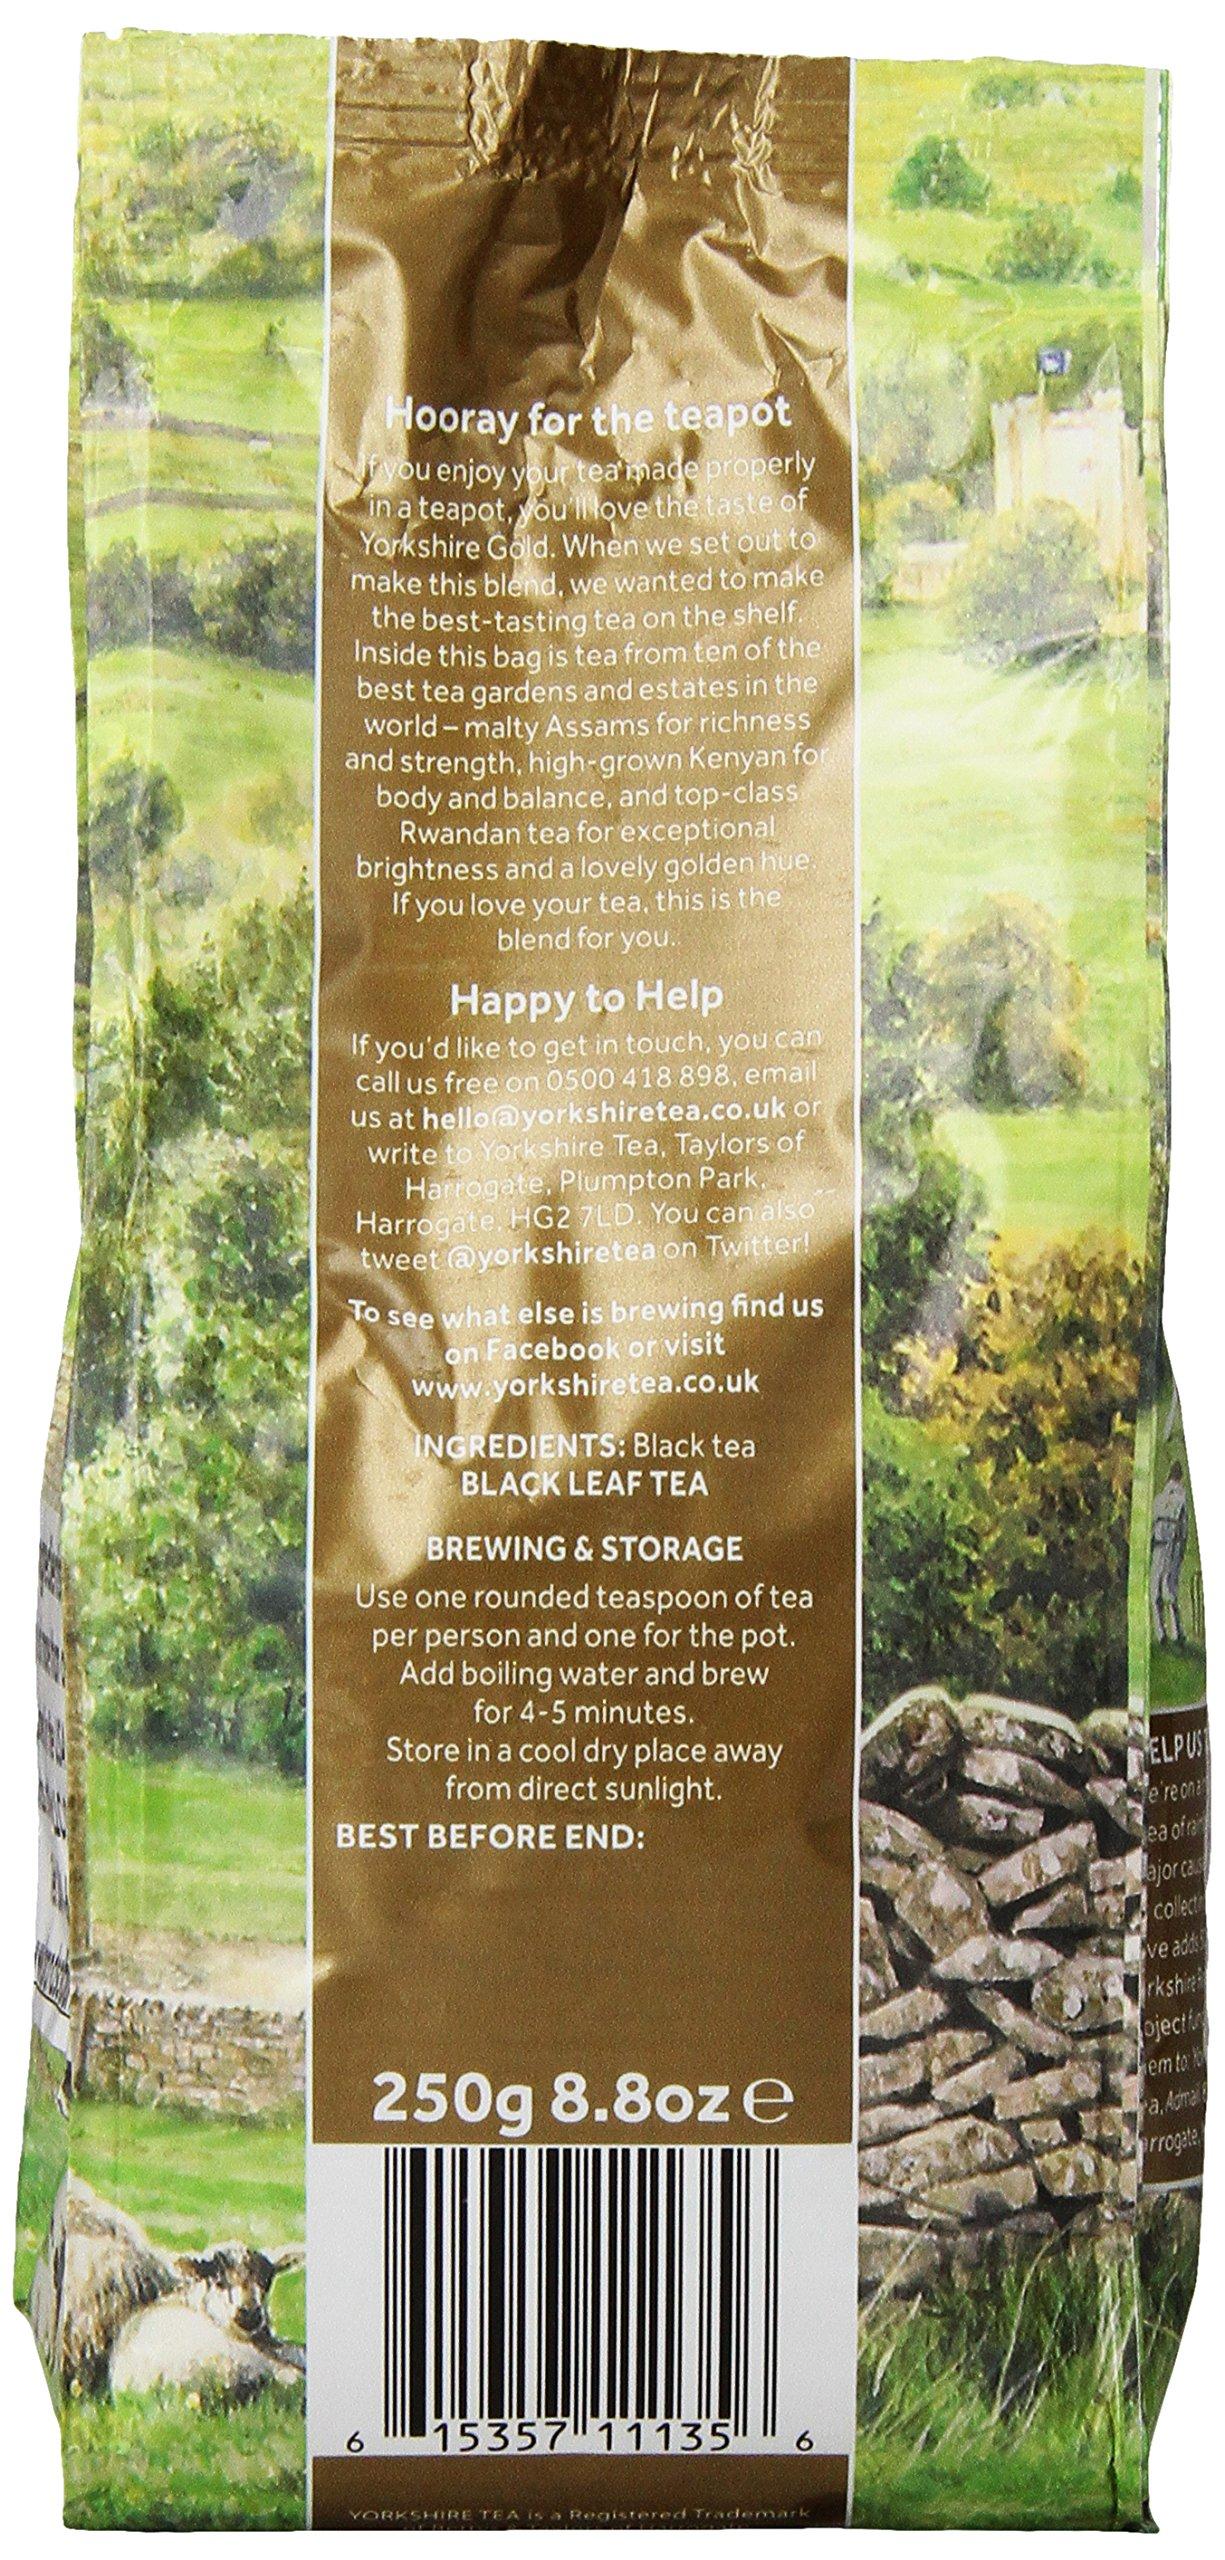 Taylors-of-Harrogate-Yorkshire-Gold-Tea-leaf-250g-loser-schwarzer-Tee